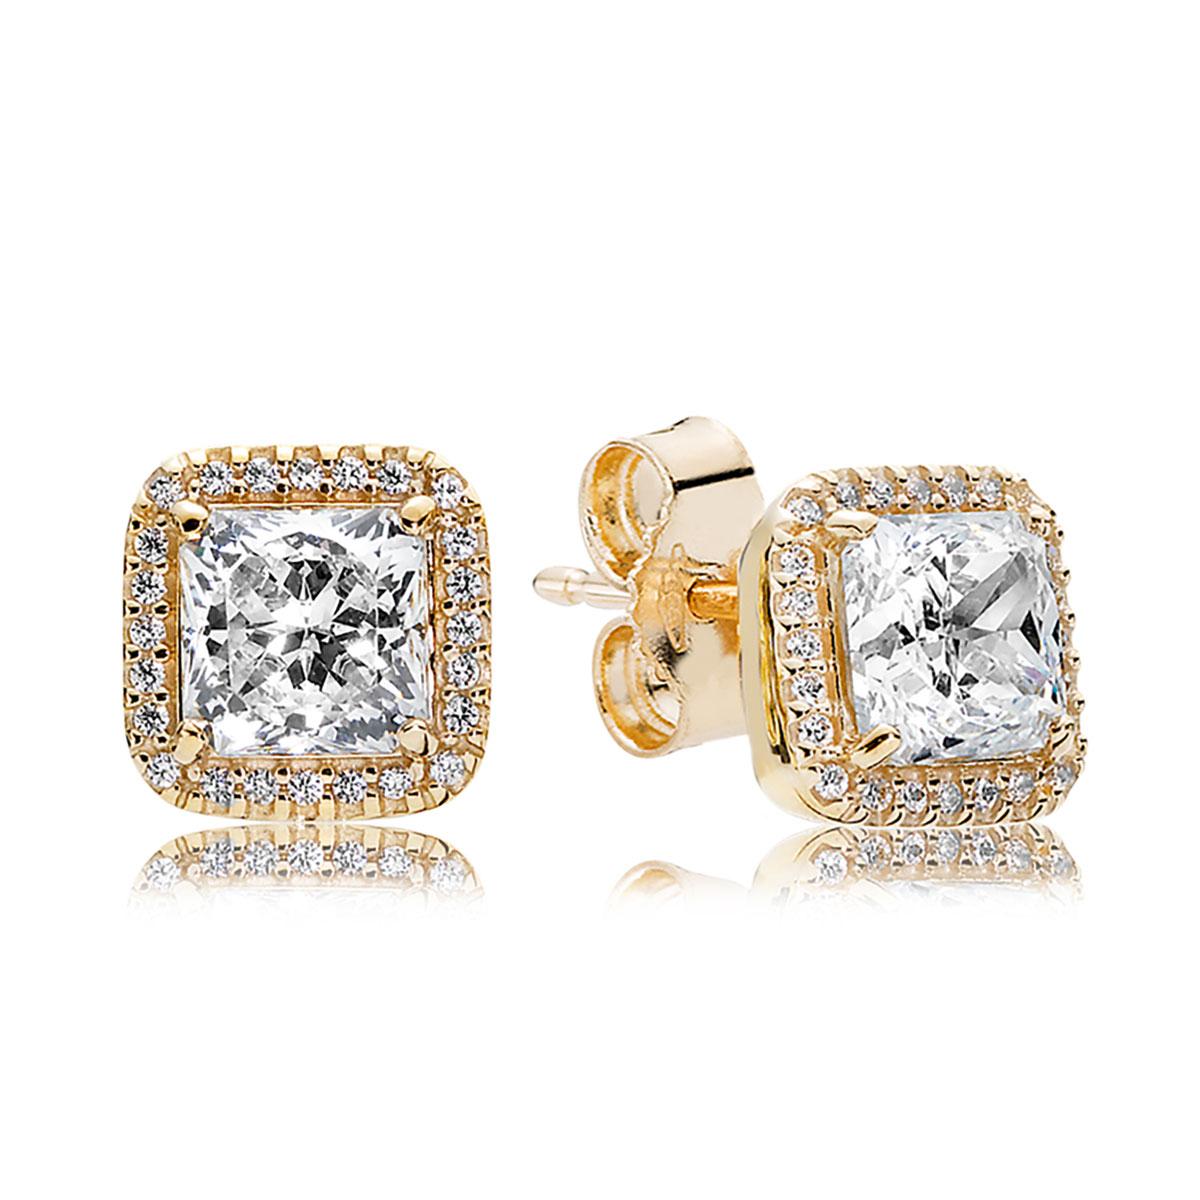 836ceef09 PANDORA Timeless Elegance, 14K Gold & Clear CZ Earrings